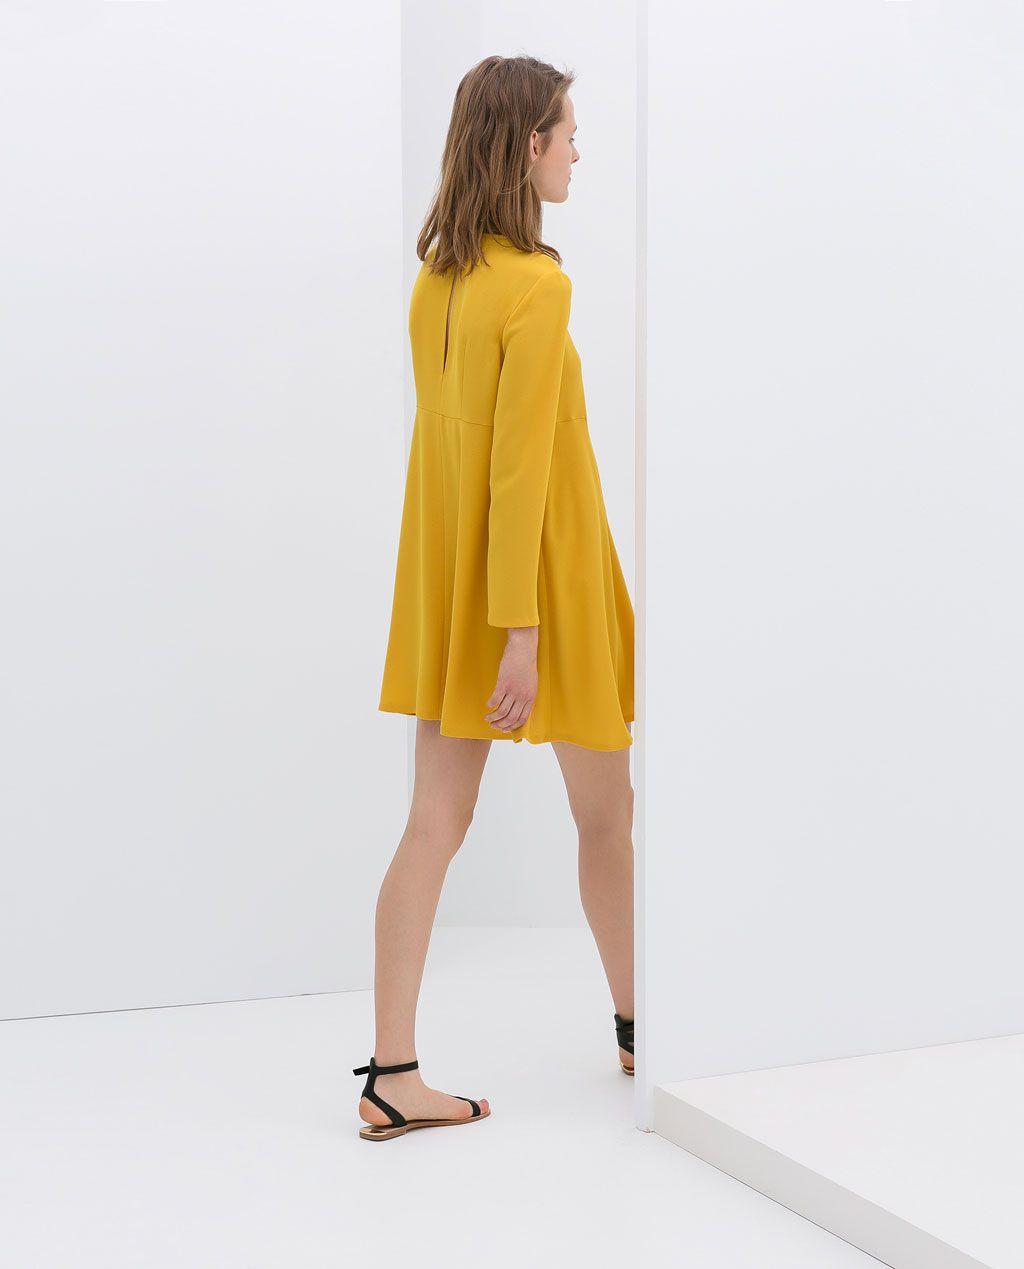 Yellow dress long sleeve  ZARA  WOMAN  LONGSLEEVE DRESS  Dresses  Pinterest  Sleeved